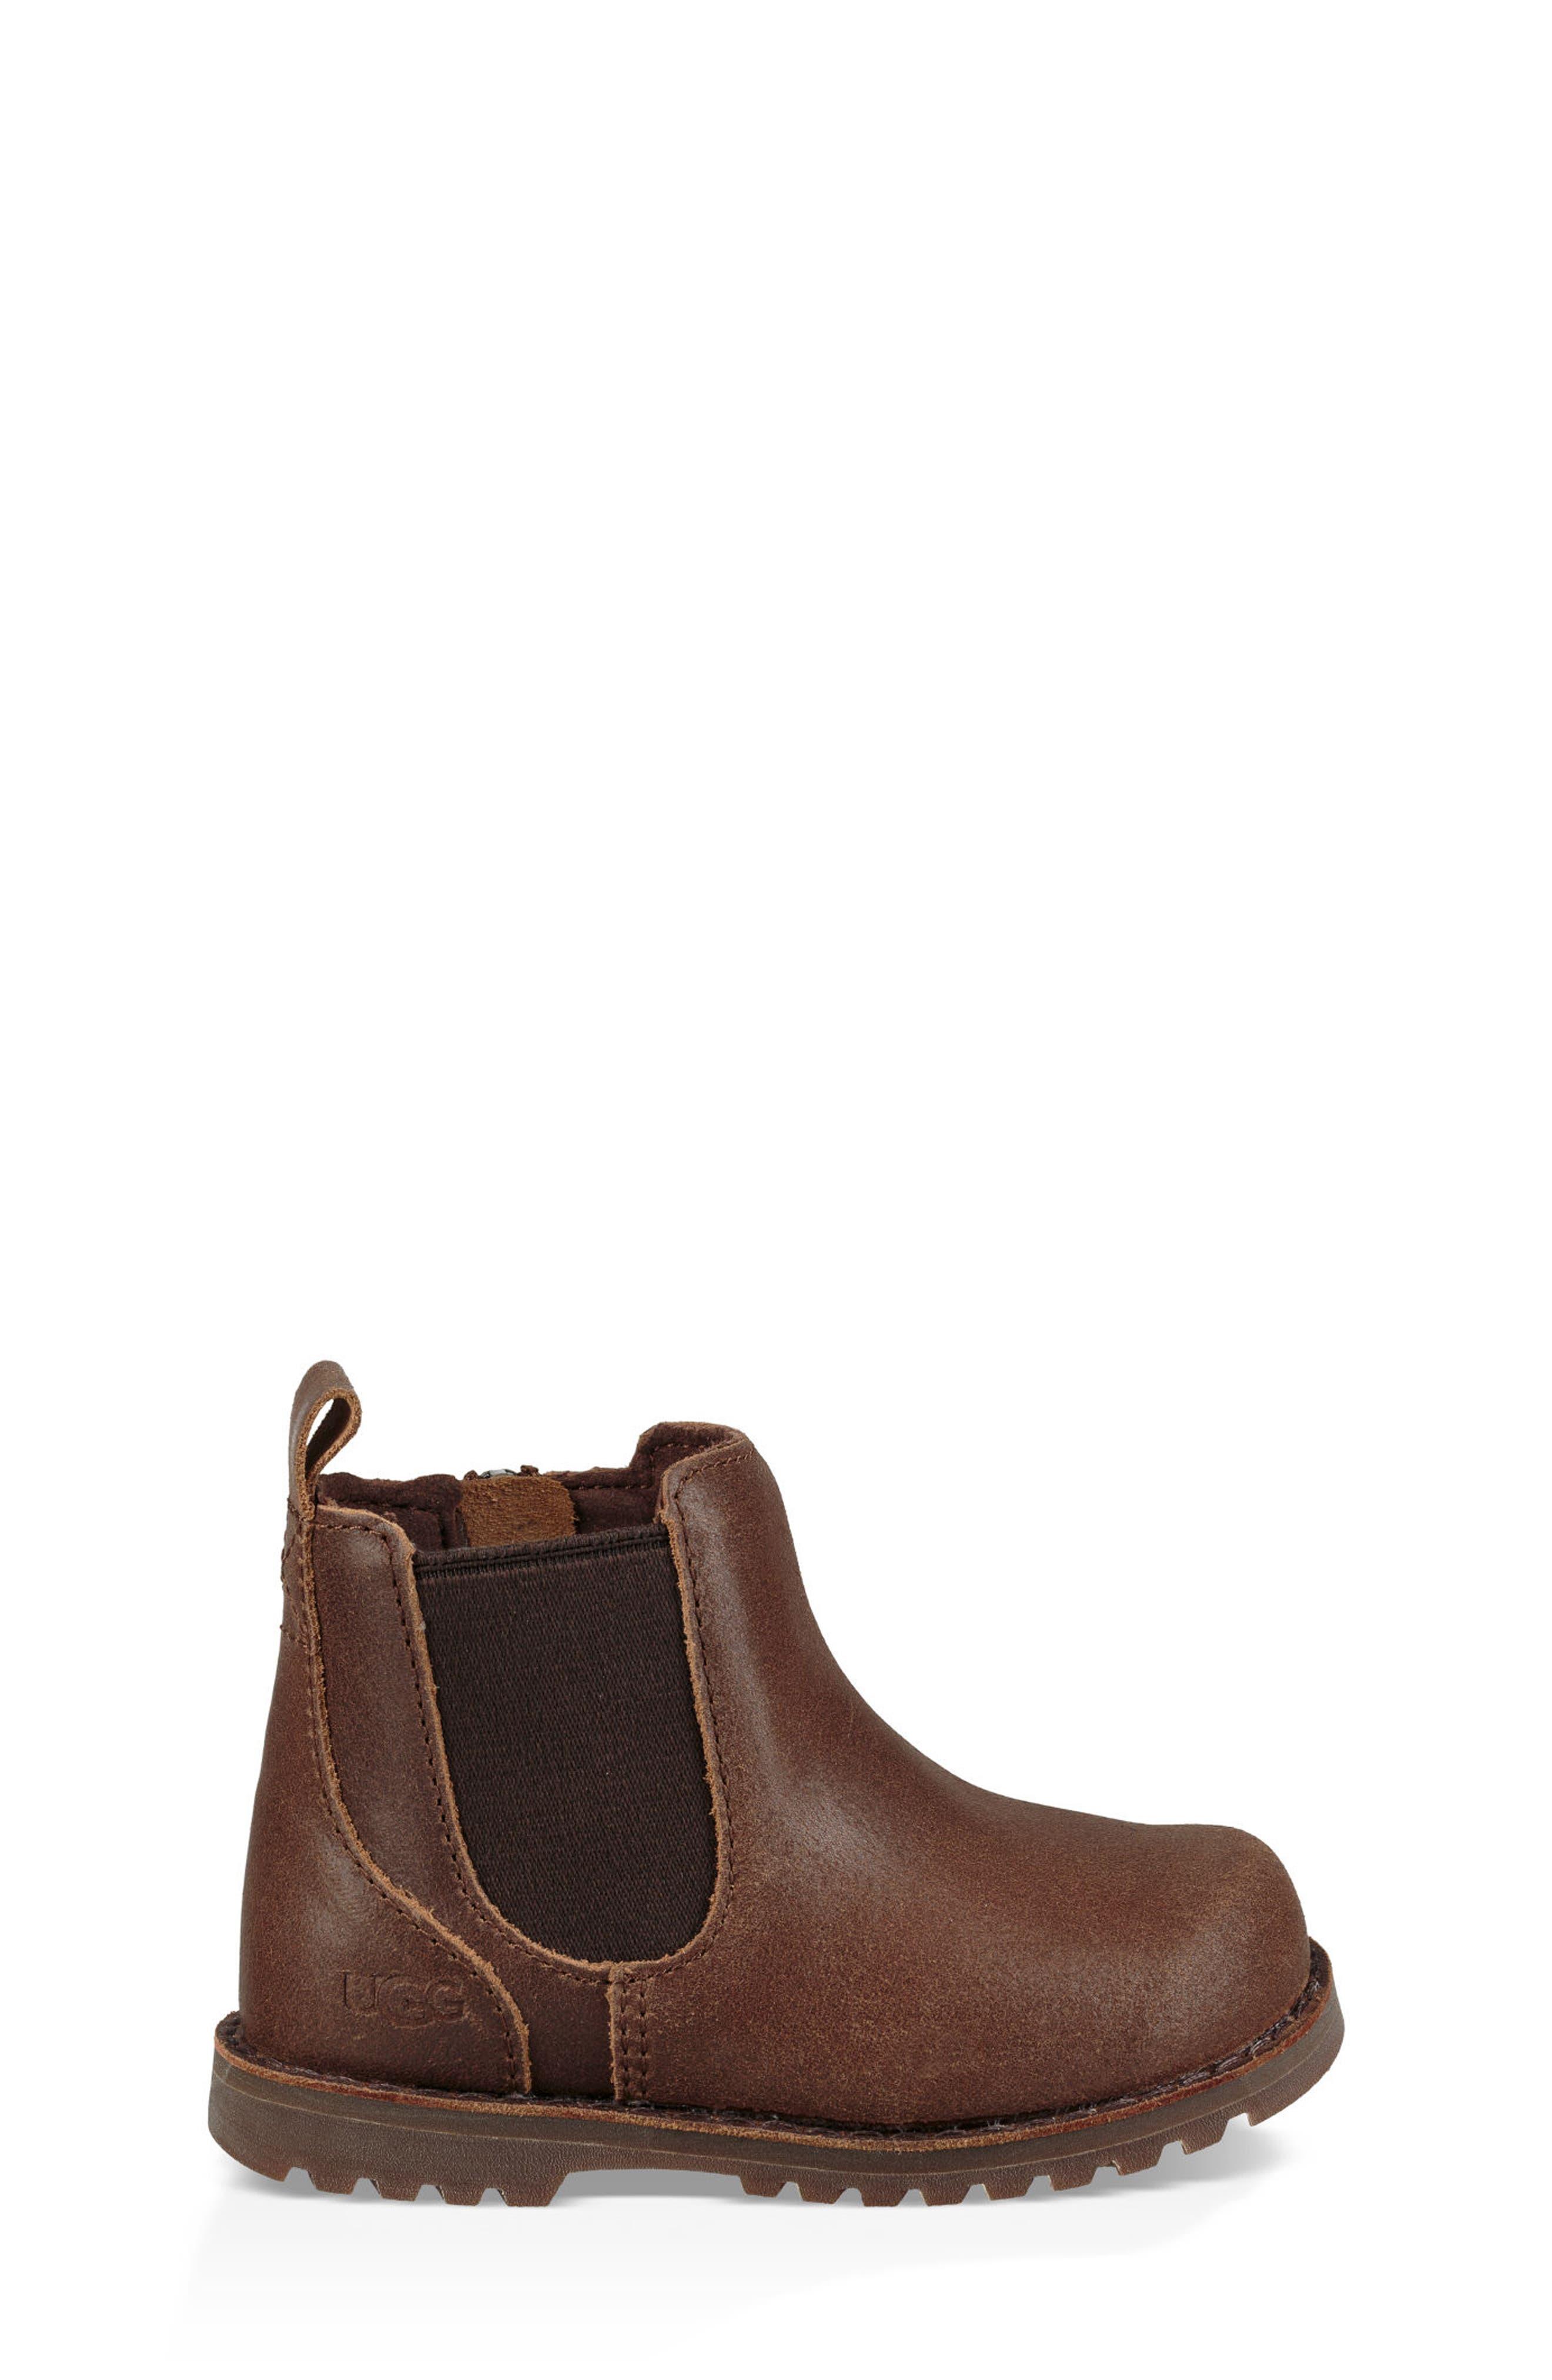 Callum Water Resistant Chelsea Boot,                             Alternate thumbnail 4, color,                             Chocolate Brown